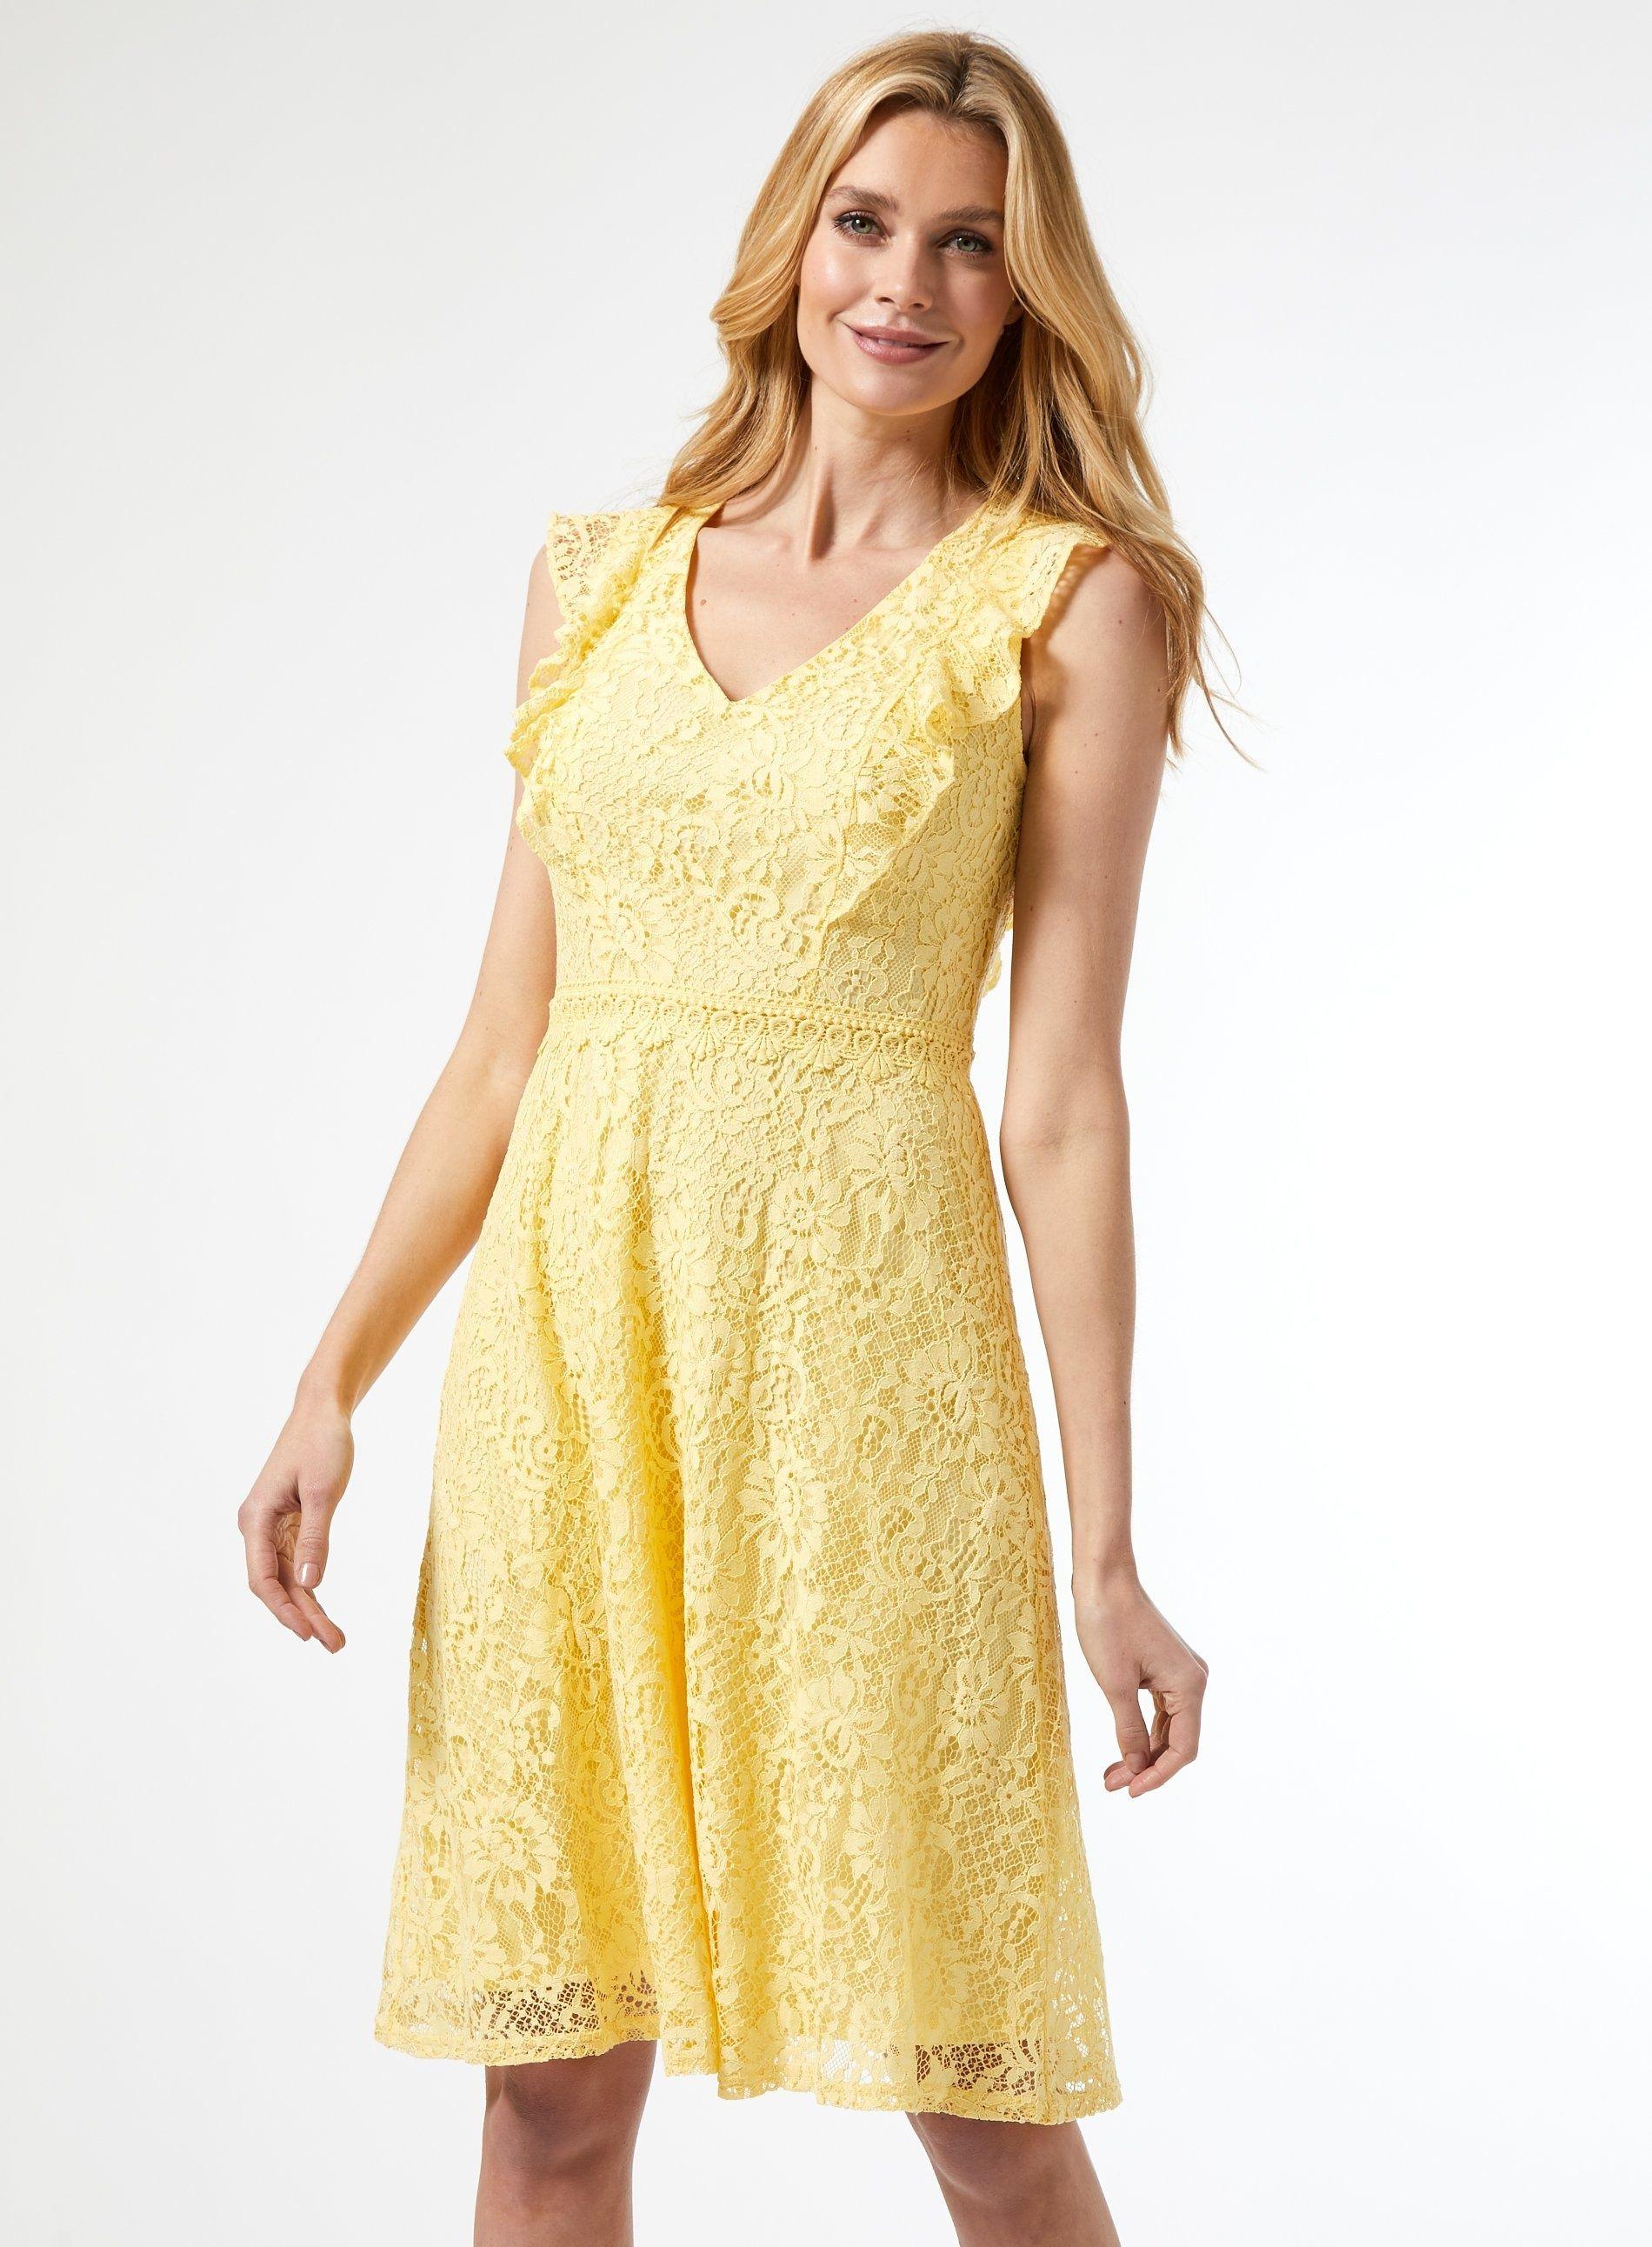 Dorothy Perkins Womens Yellow Lace Taylor Skater Dress Knee-Long V-Neck Back Zip